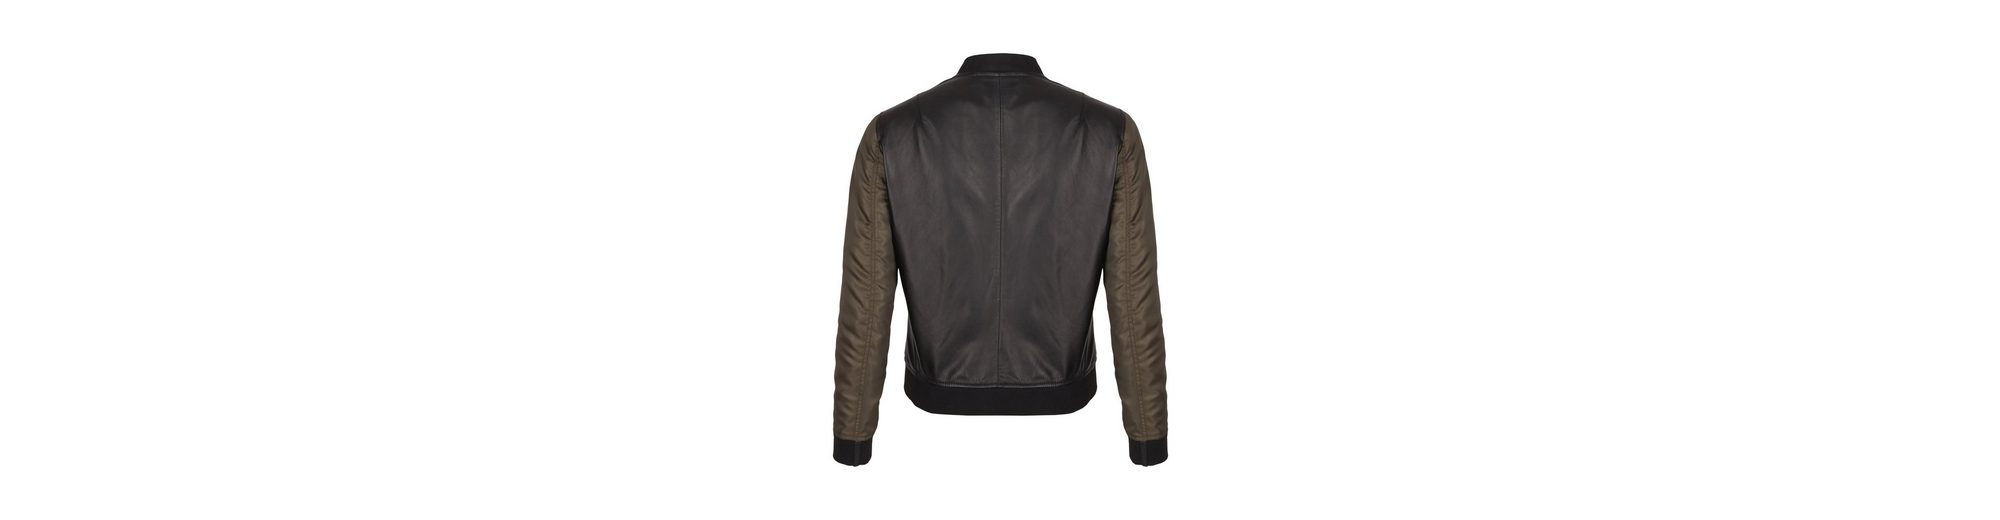 Verkauf Online-Shopping Daniel Hechter Blouson aus Leder Günstig Kaufen Erschwinglich xzF8a5Do